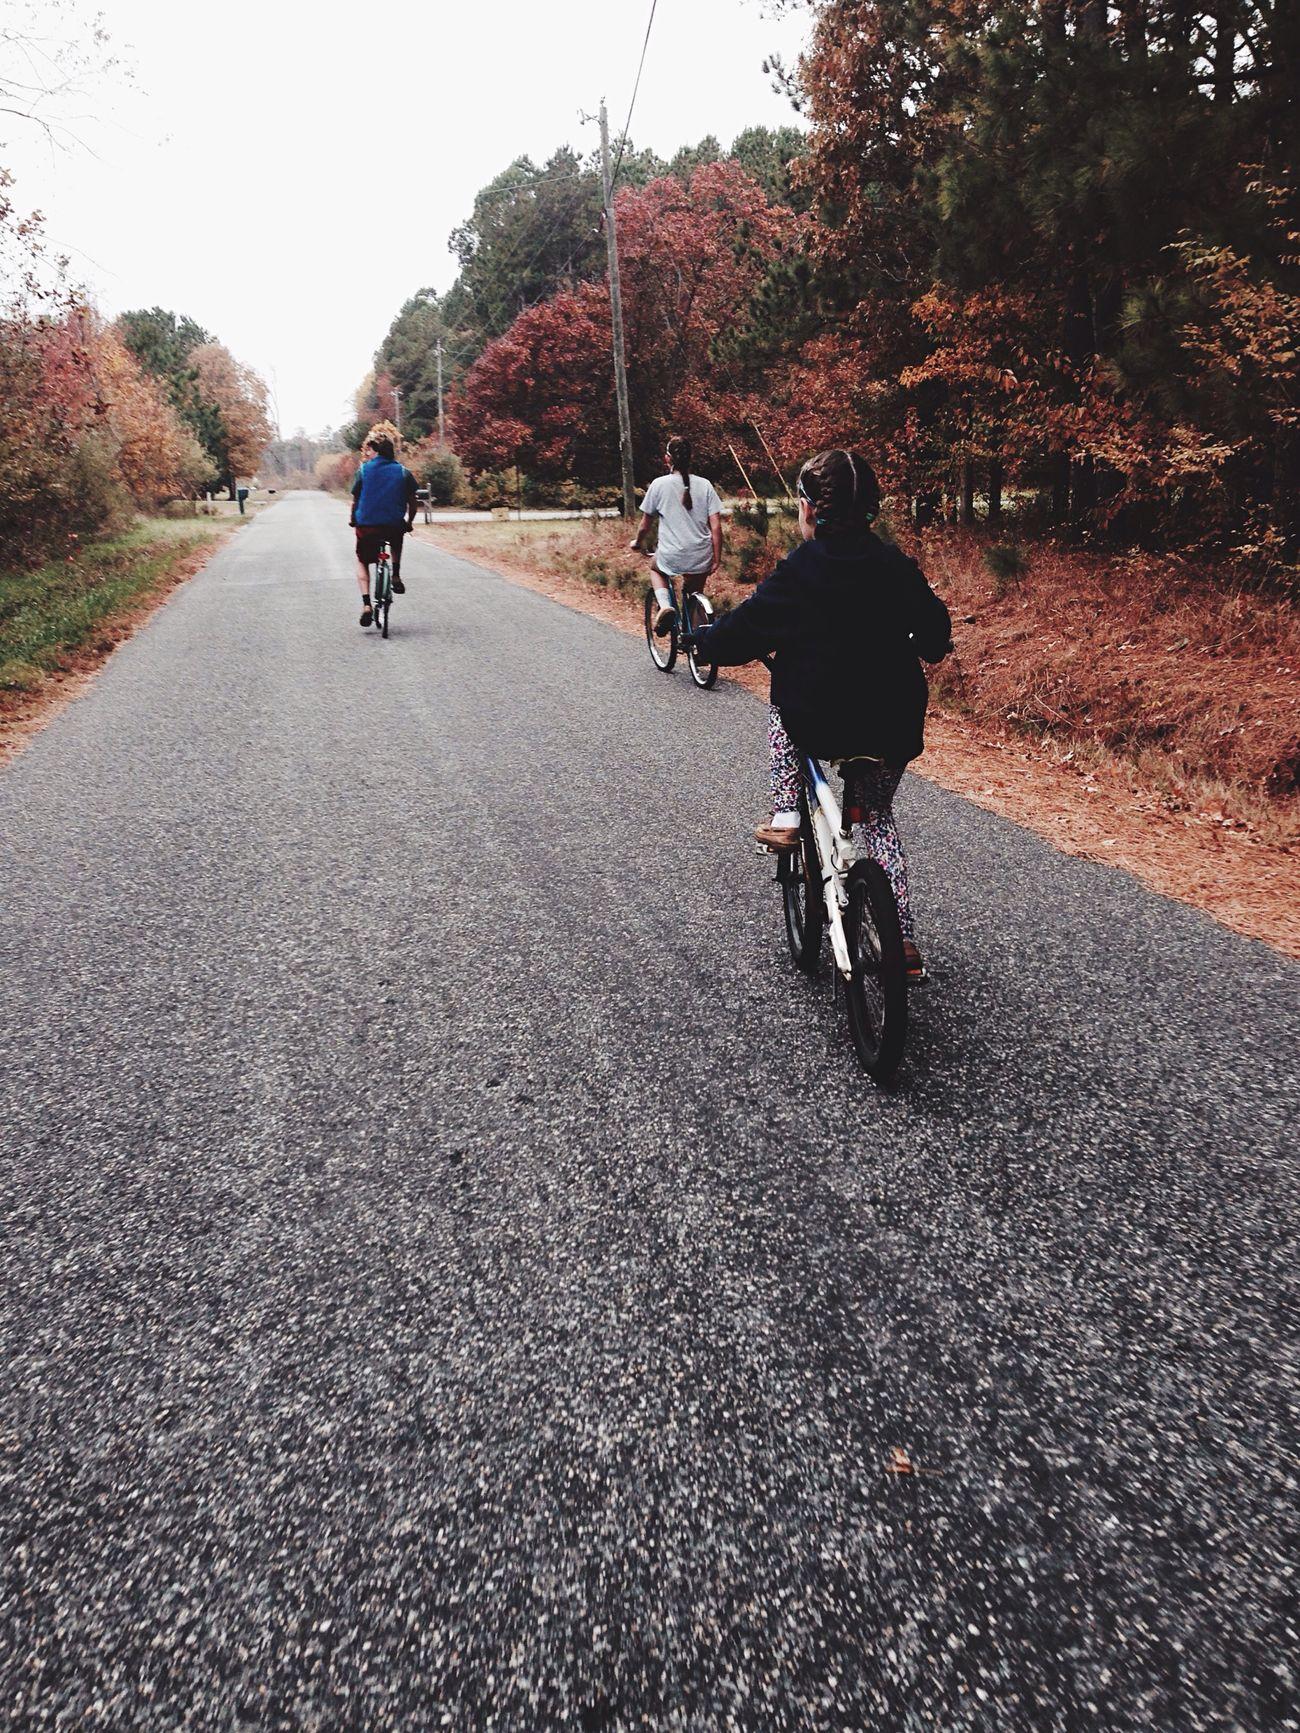 Morning bike ride Bicycle Cycling Riding Fall